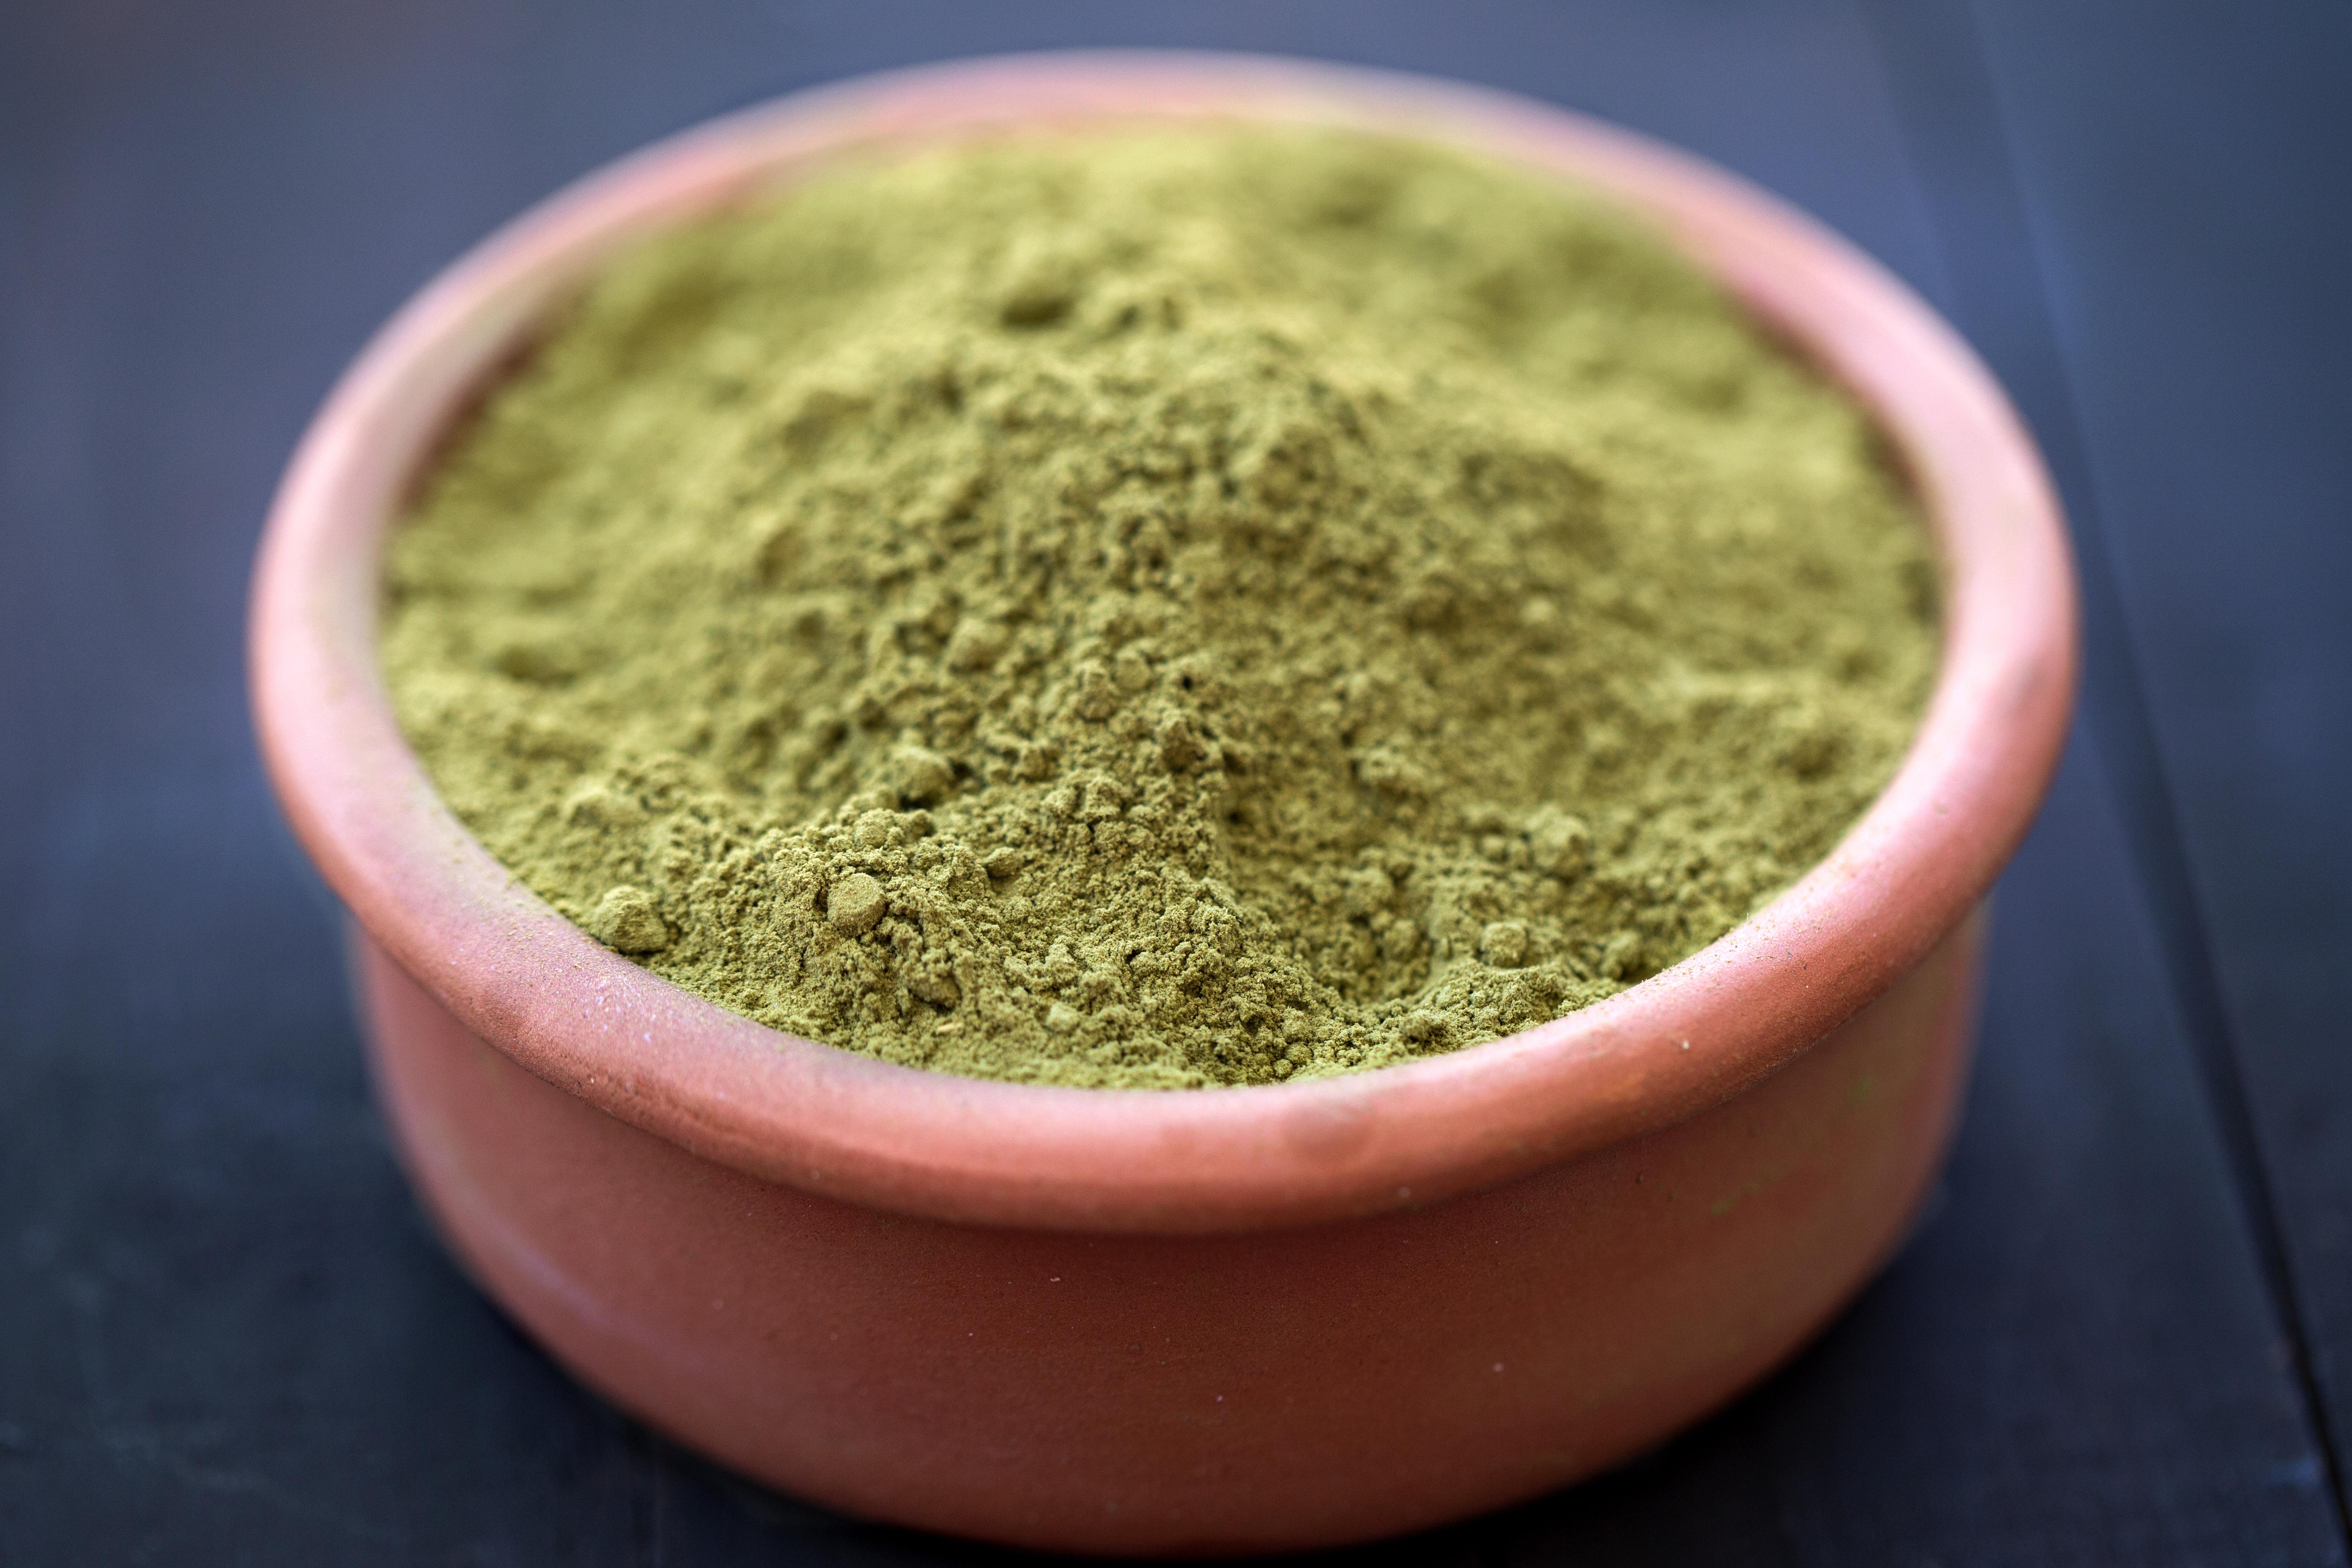 White Veined Hulu Kapuas Kratom Powder